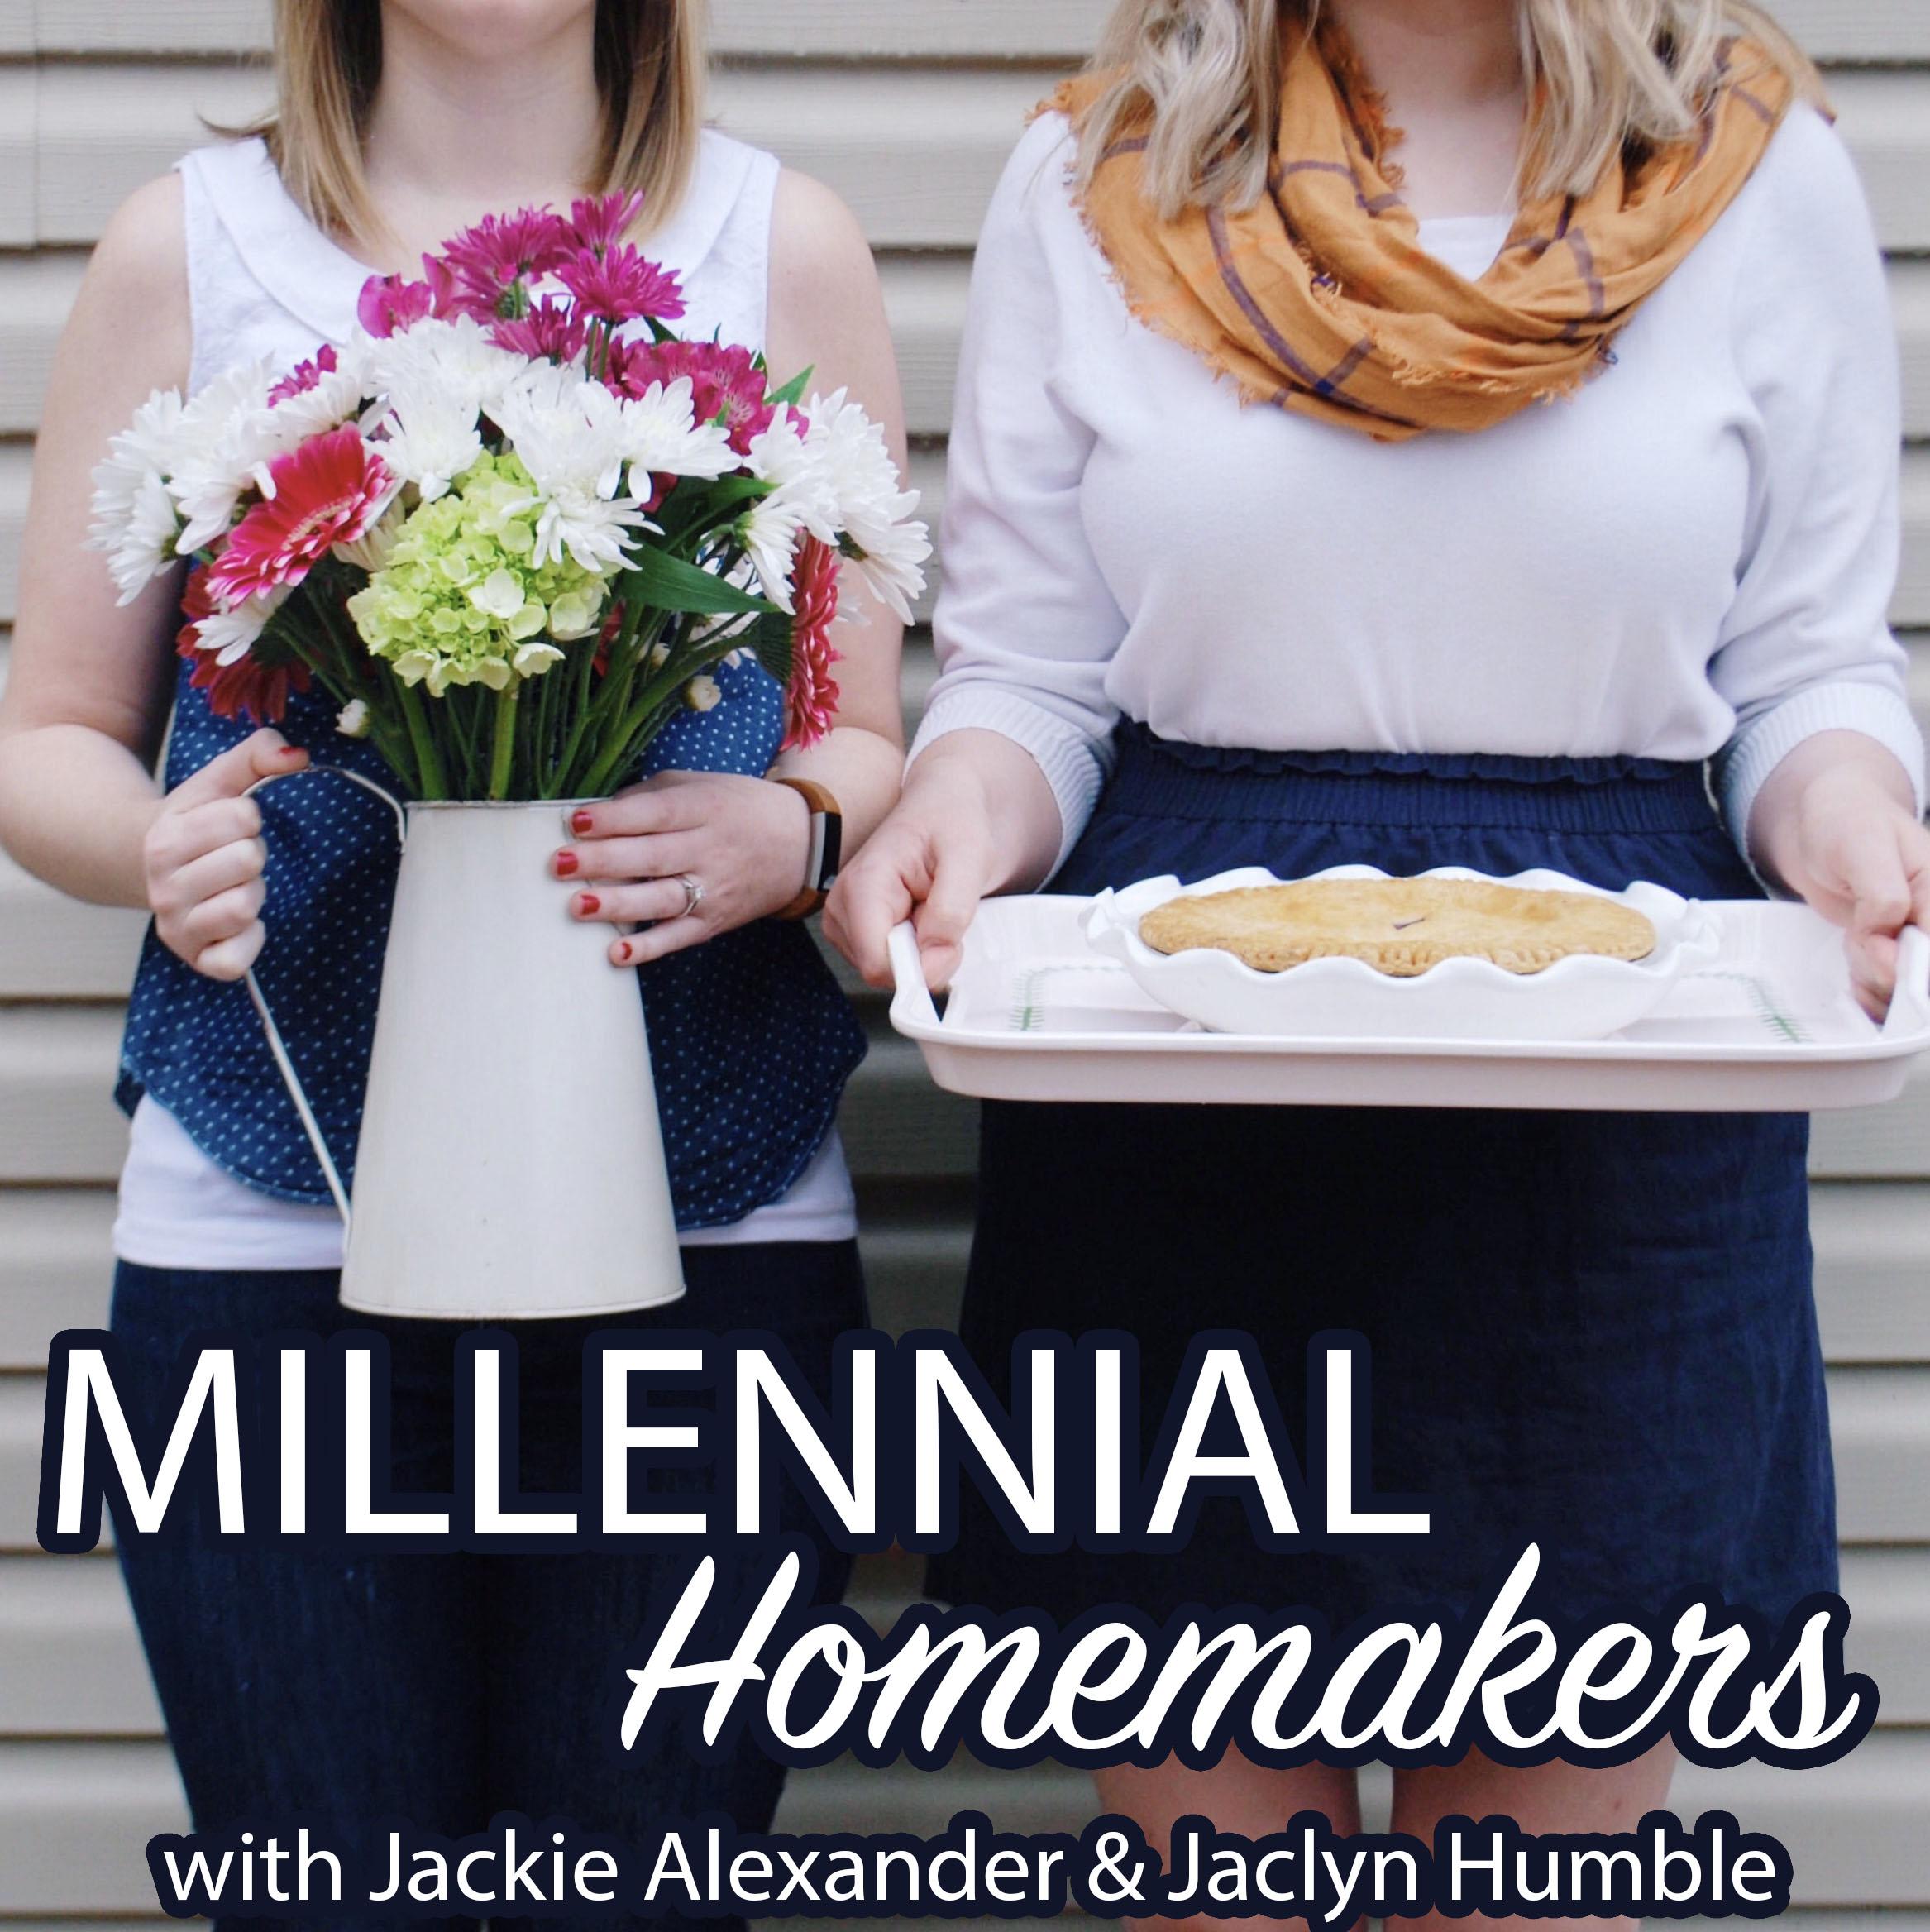 The Millennial Homemakers™: Interior Decorating, Hostessing